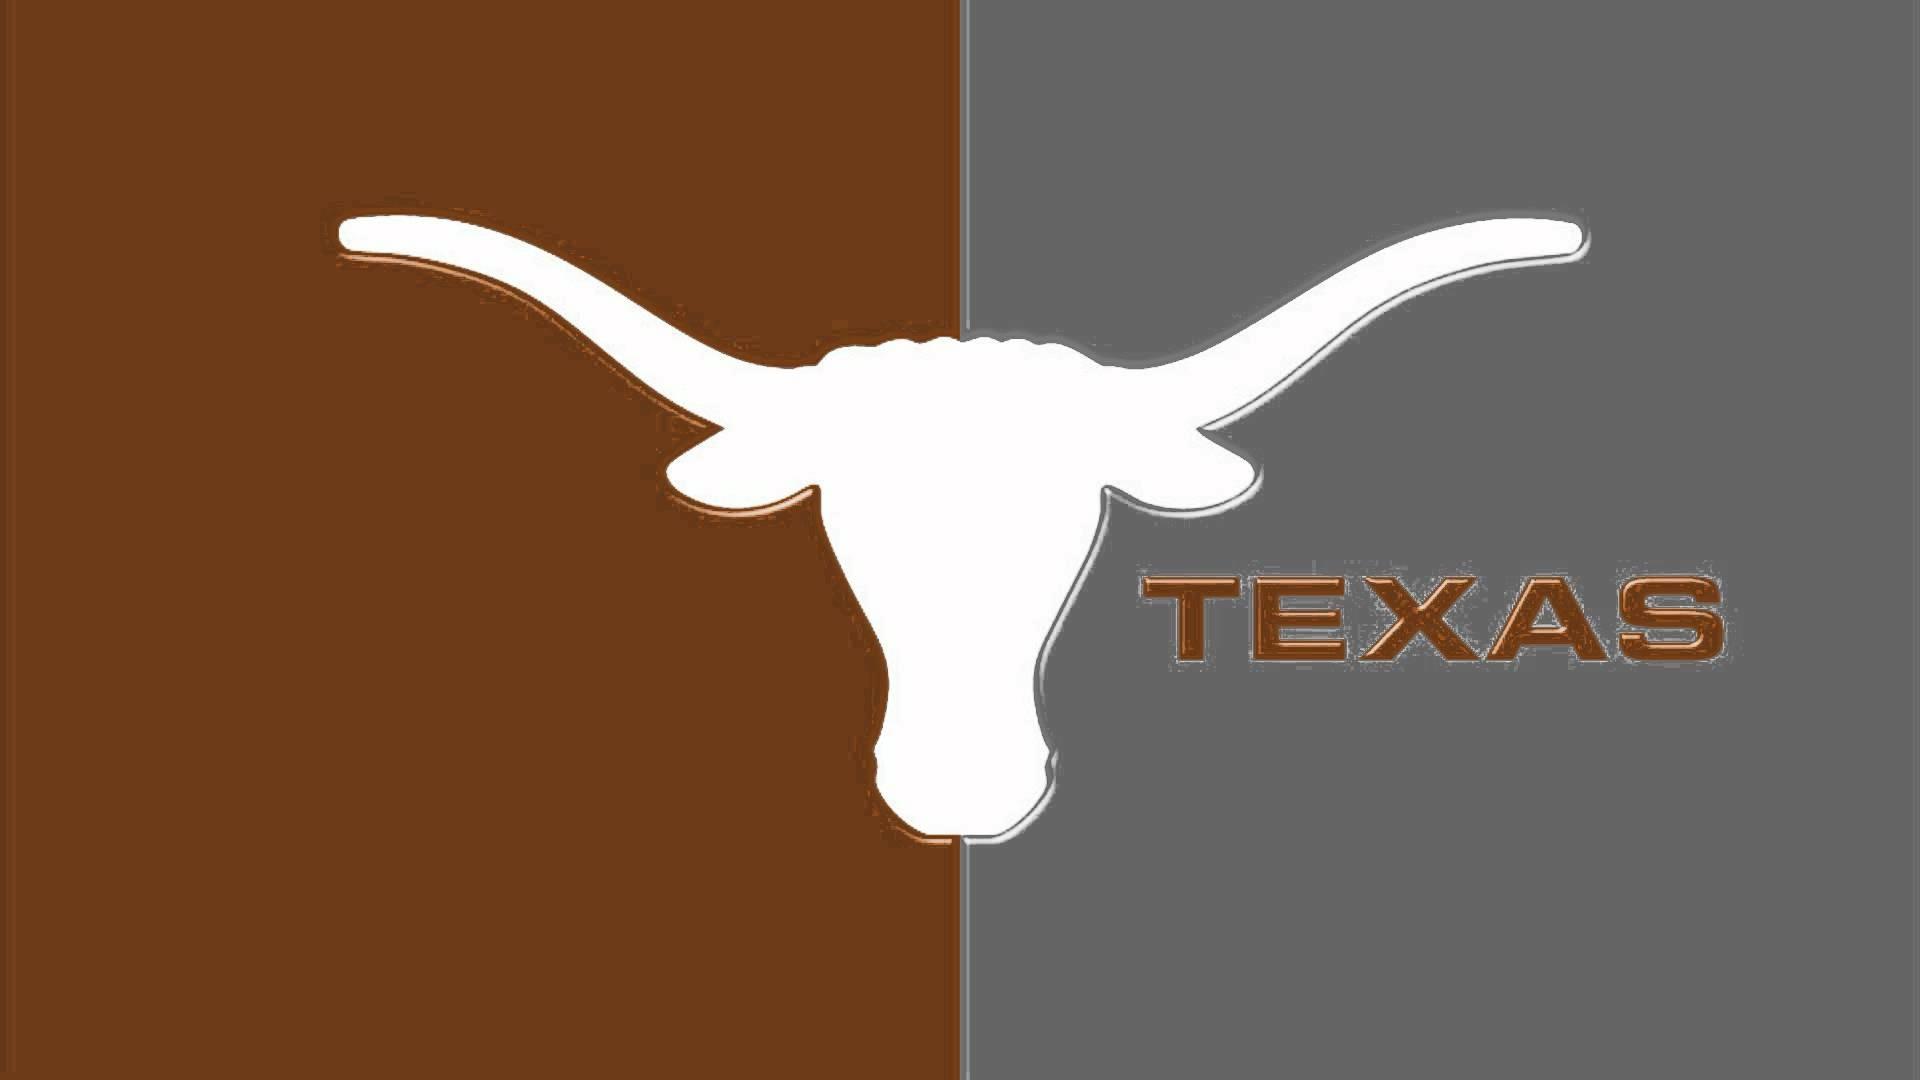 Texas Longhorn Wallpaper Free